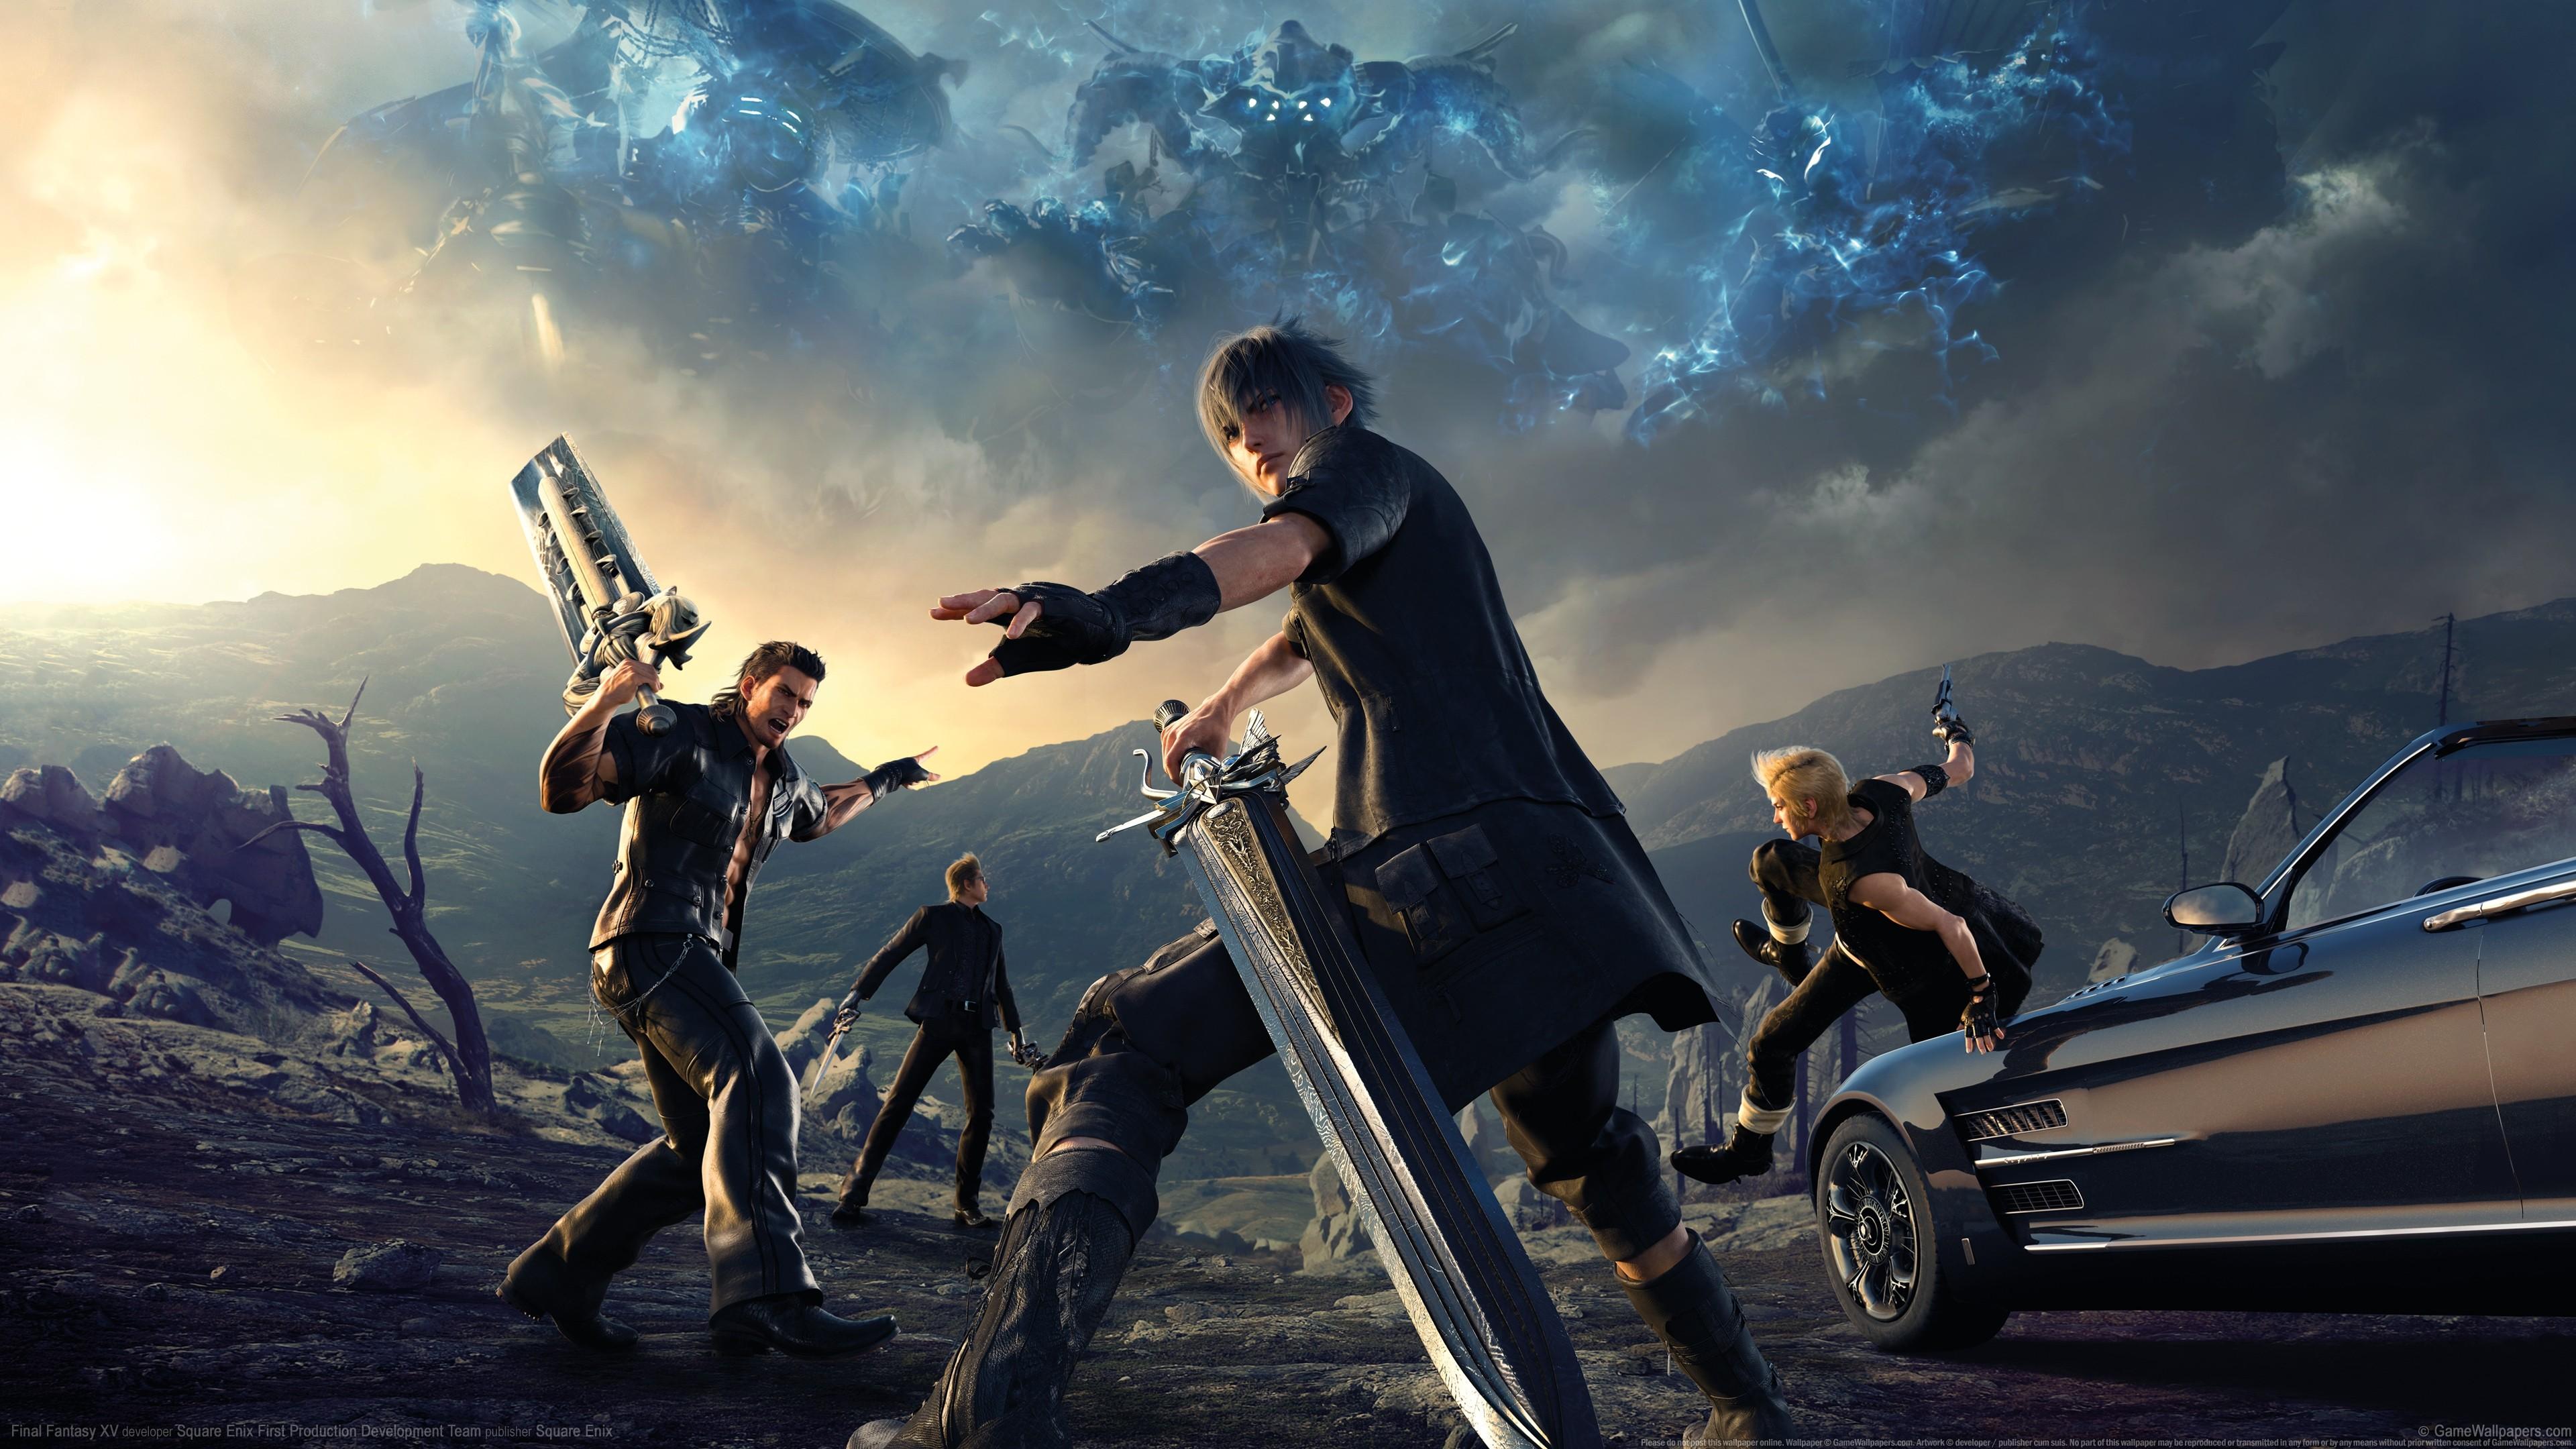 Gamer Final Fantasy XV Noctis Ignis Prompto Gladiolus Screenshot Atmosphere Of Earth Extreme Sport